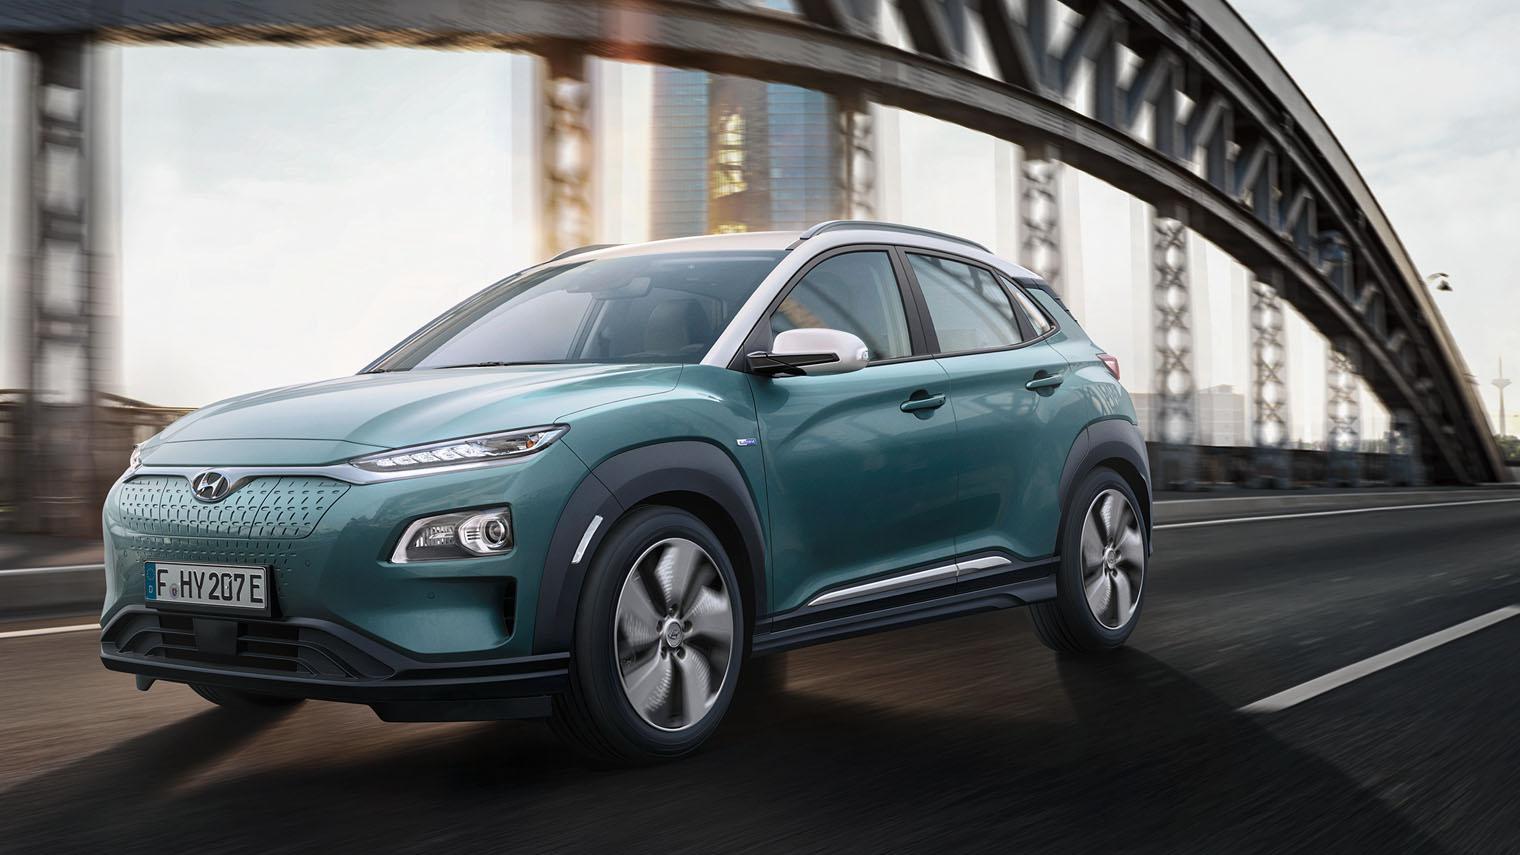 Elektrische Kona Onderstreept Groene Doelstellingen Hyundai Anwb